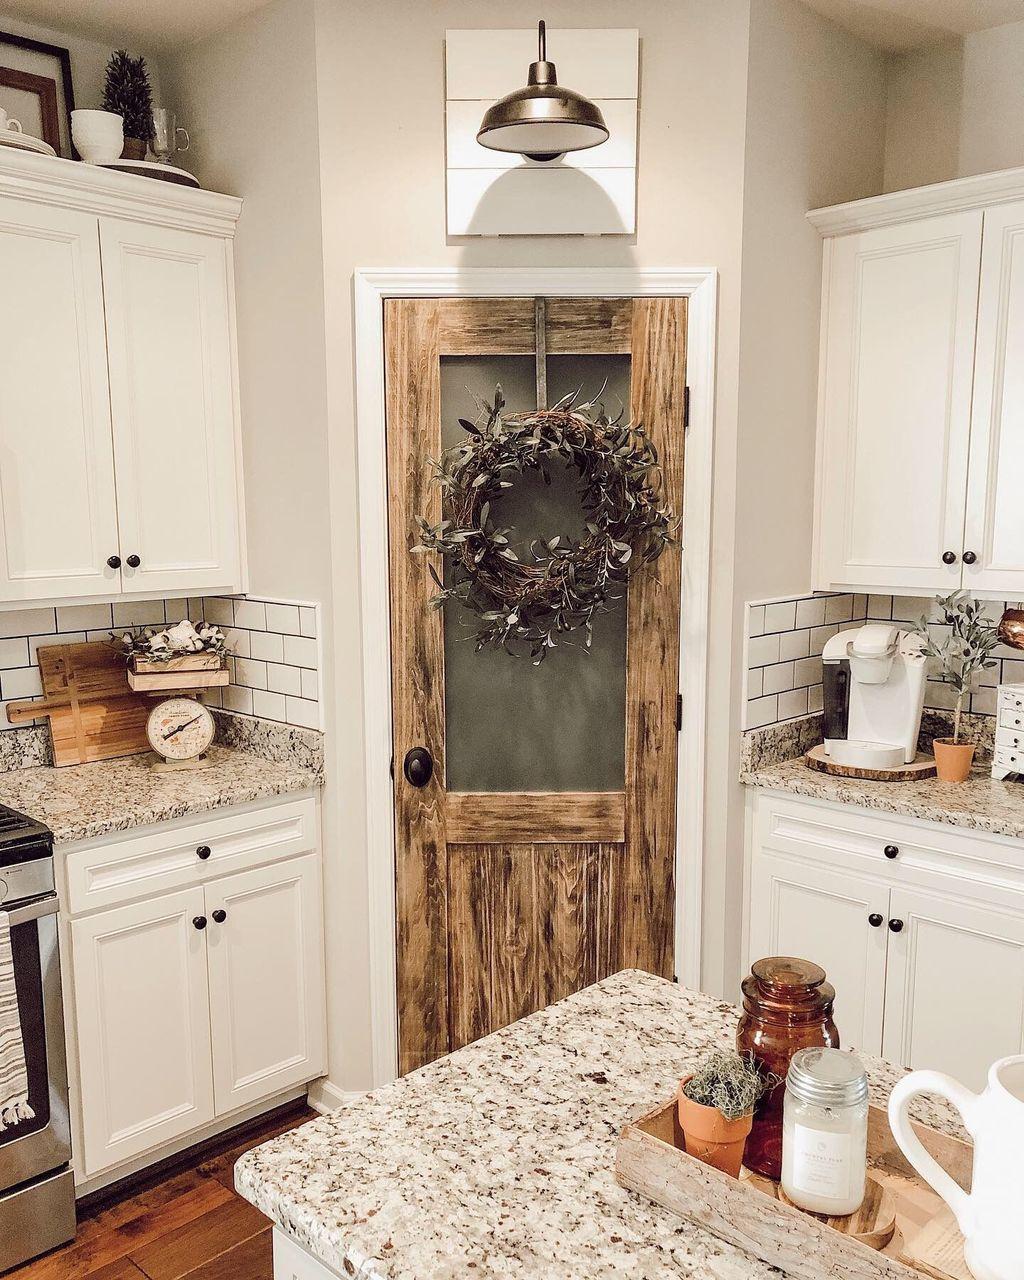 The Best Farmhouse Kitchen Decor Ideas 27